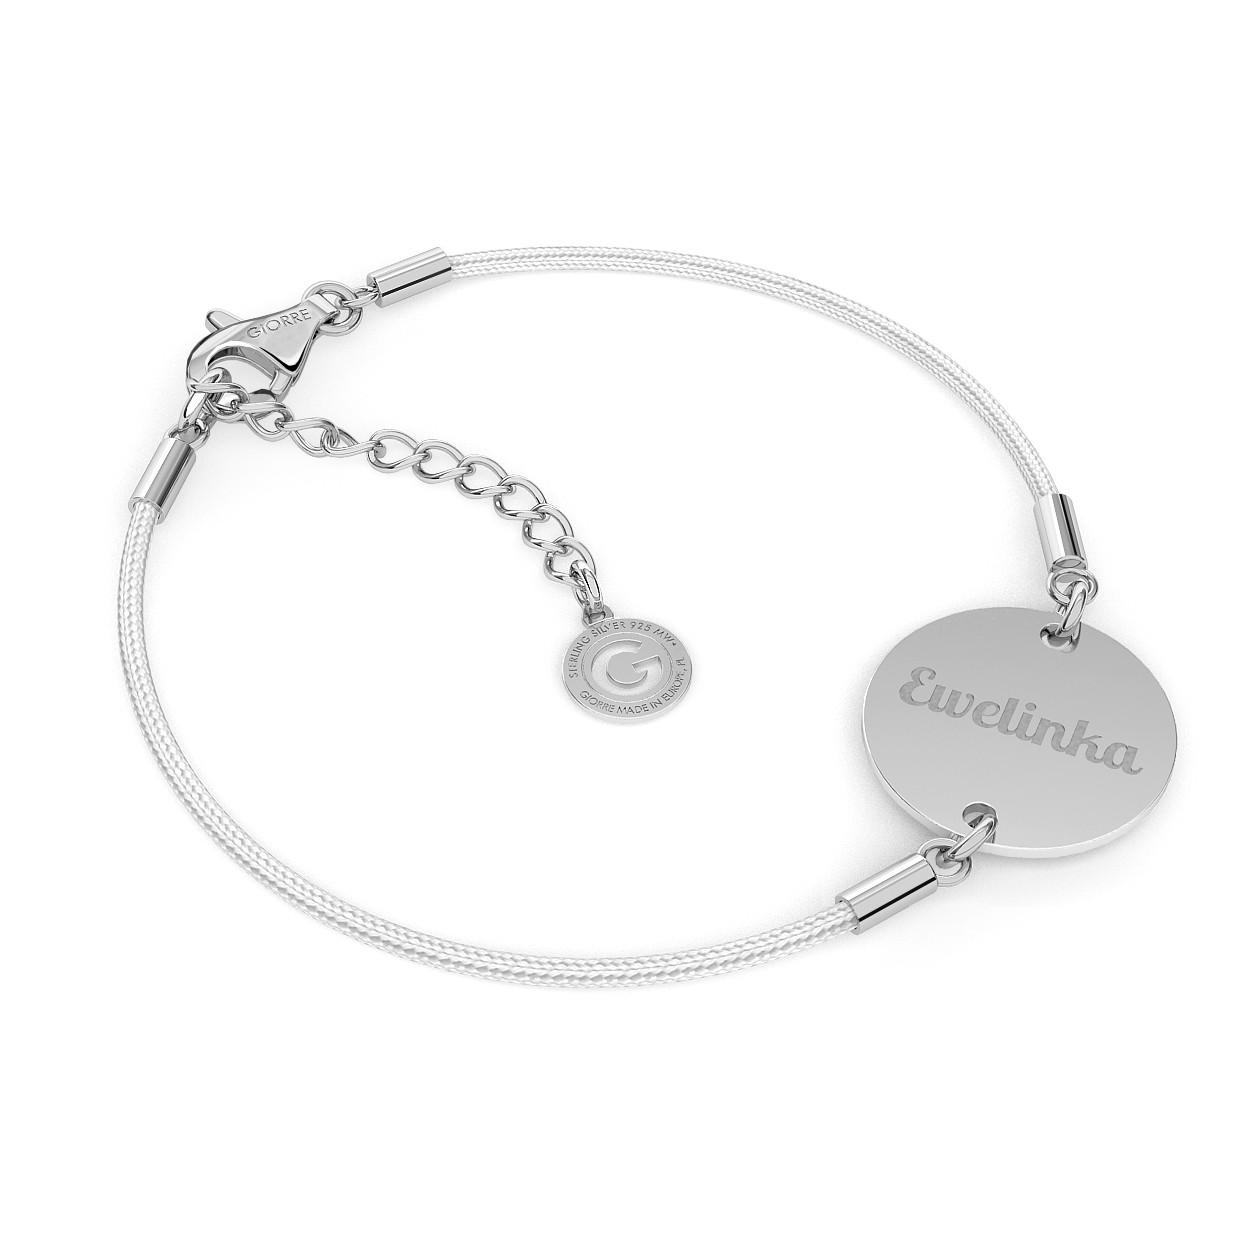 Personalized round tag bracelet